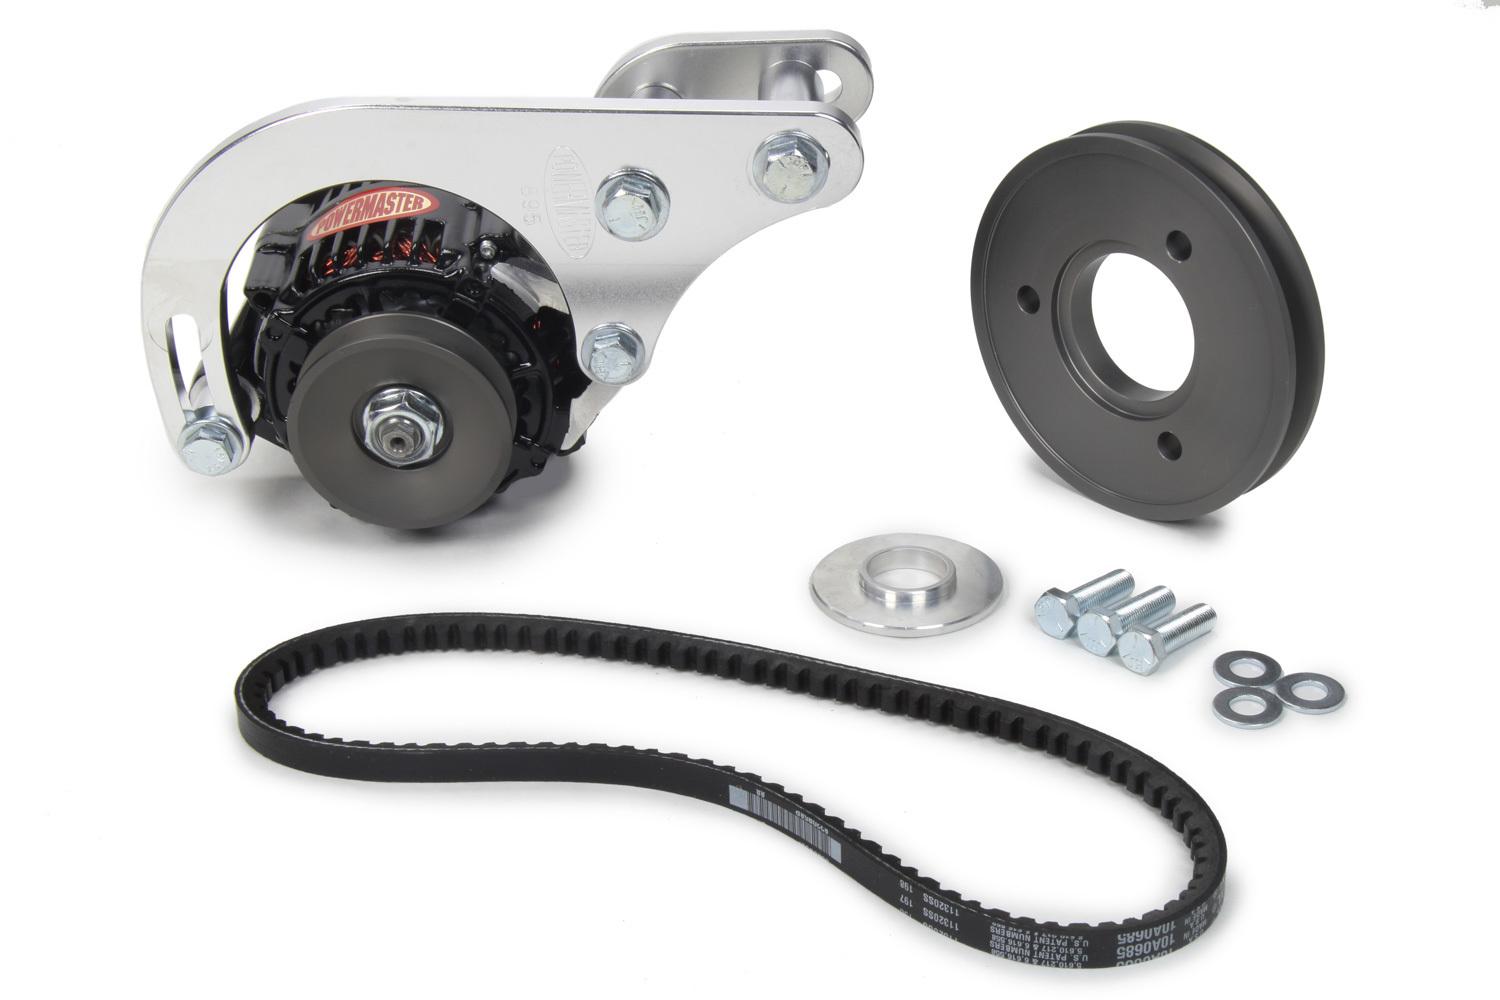 Powermaster 8-895-1 Alternator, Snug Fit, 55 amp, 12V, V-Belt Pulley, Low Mount, Mounting Kit Included, Black Powder coat, Big Bock Chevy, Kit